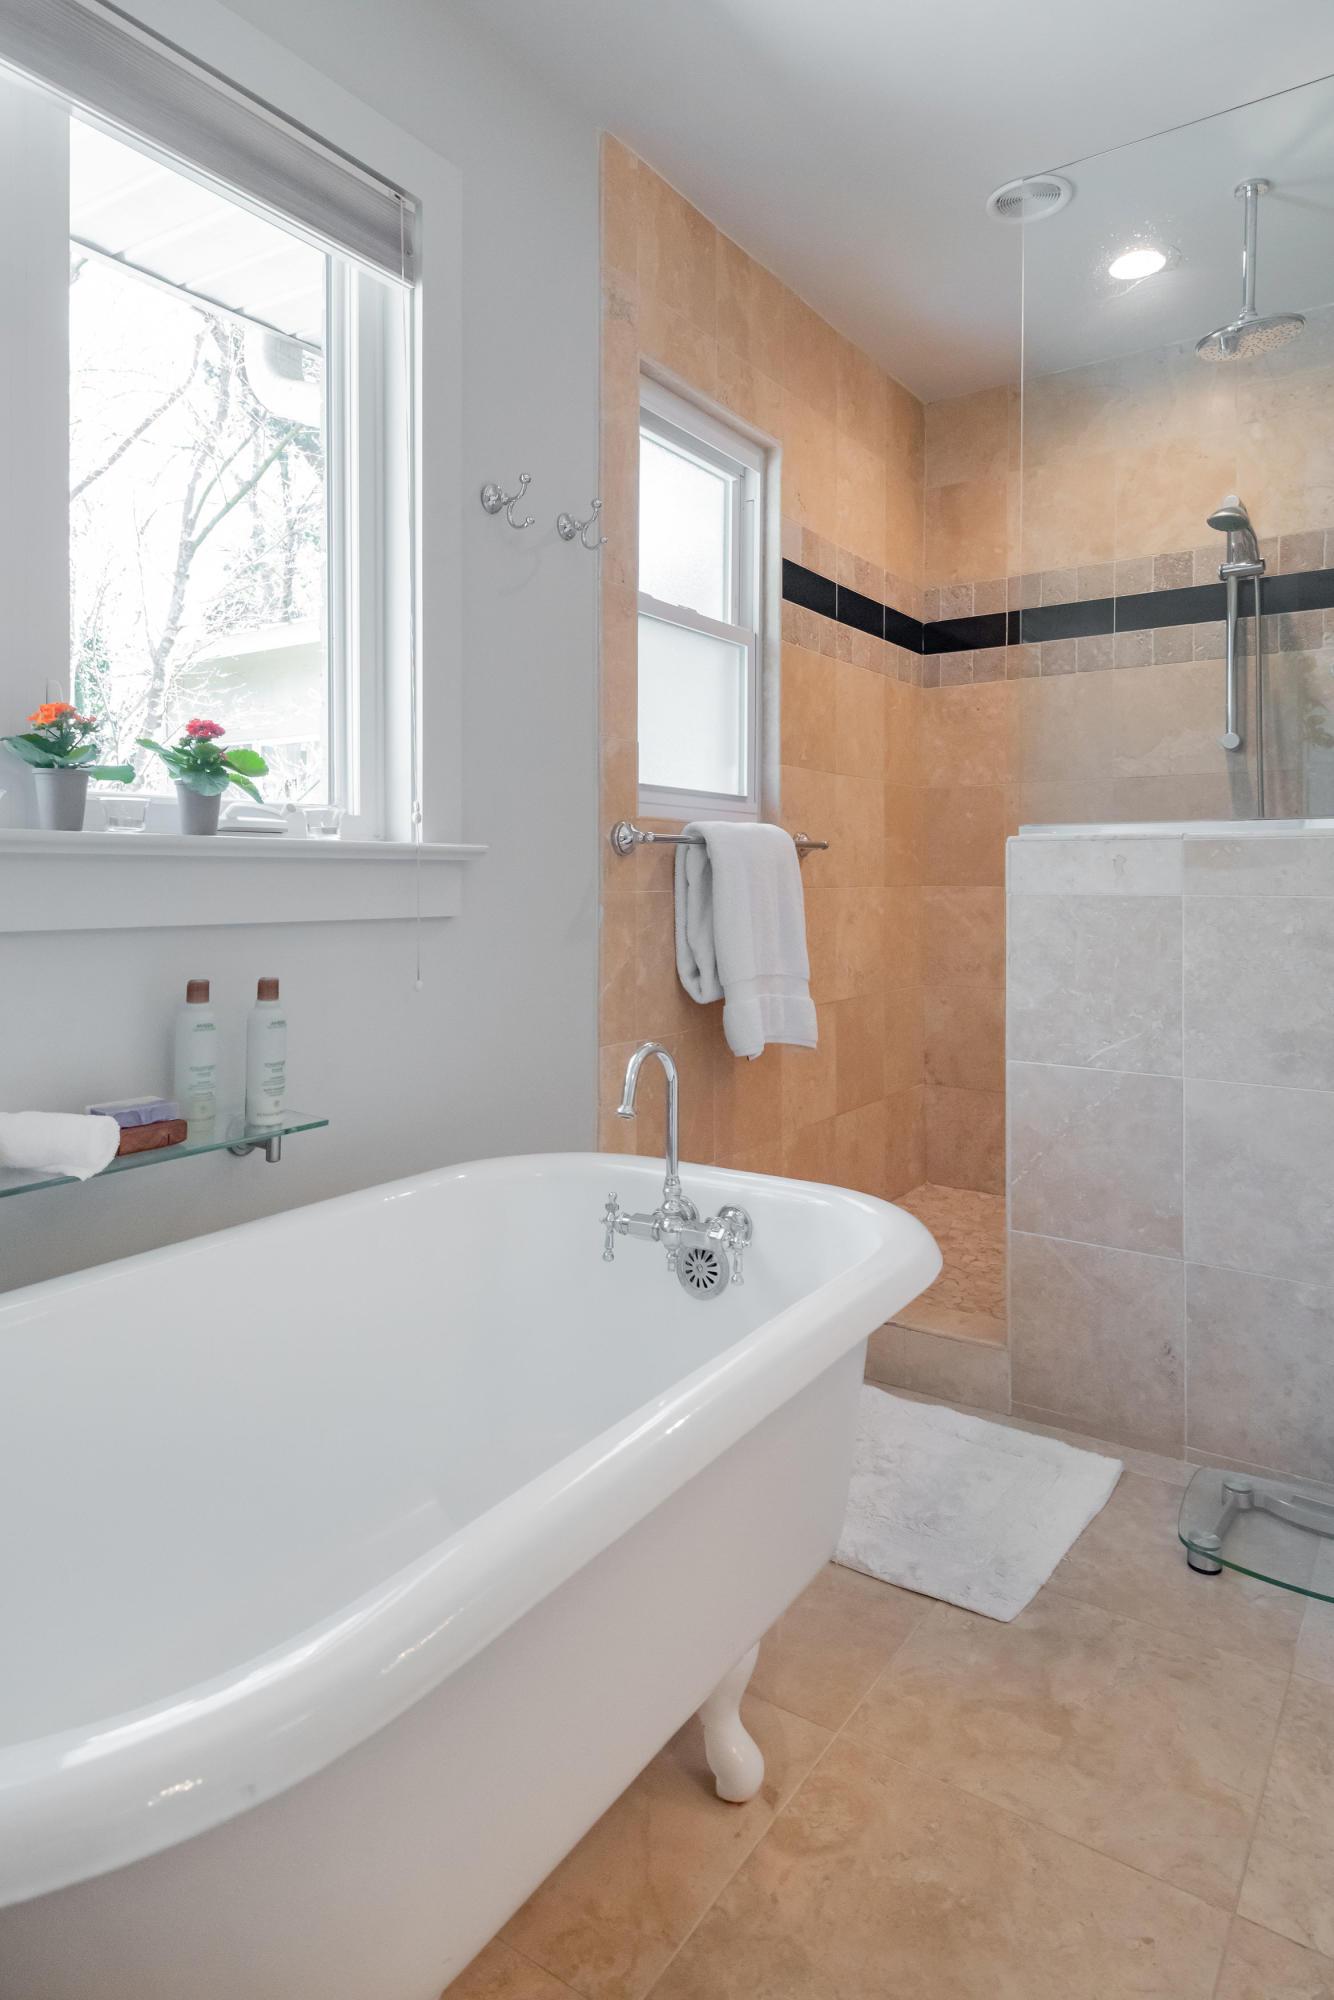 Cooper Estates Homes For Sale - 912 Searle, Mount Pleasant, SC - 2